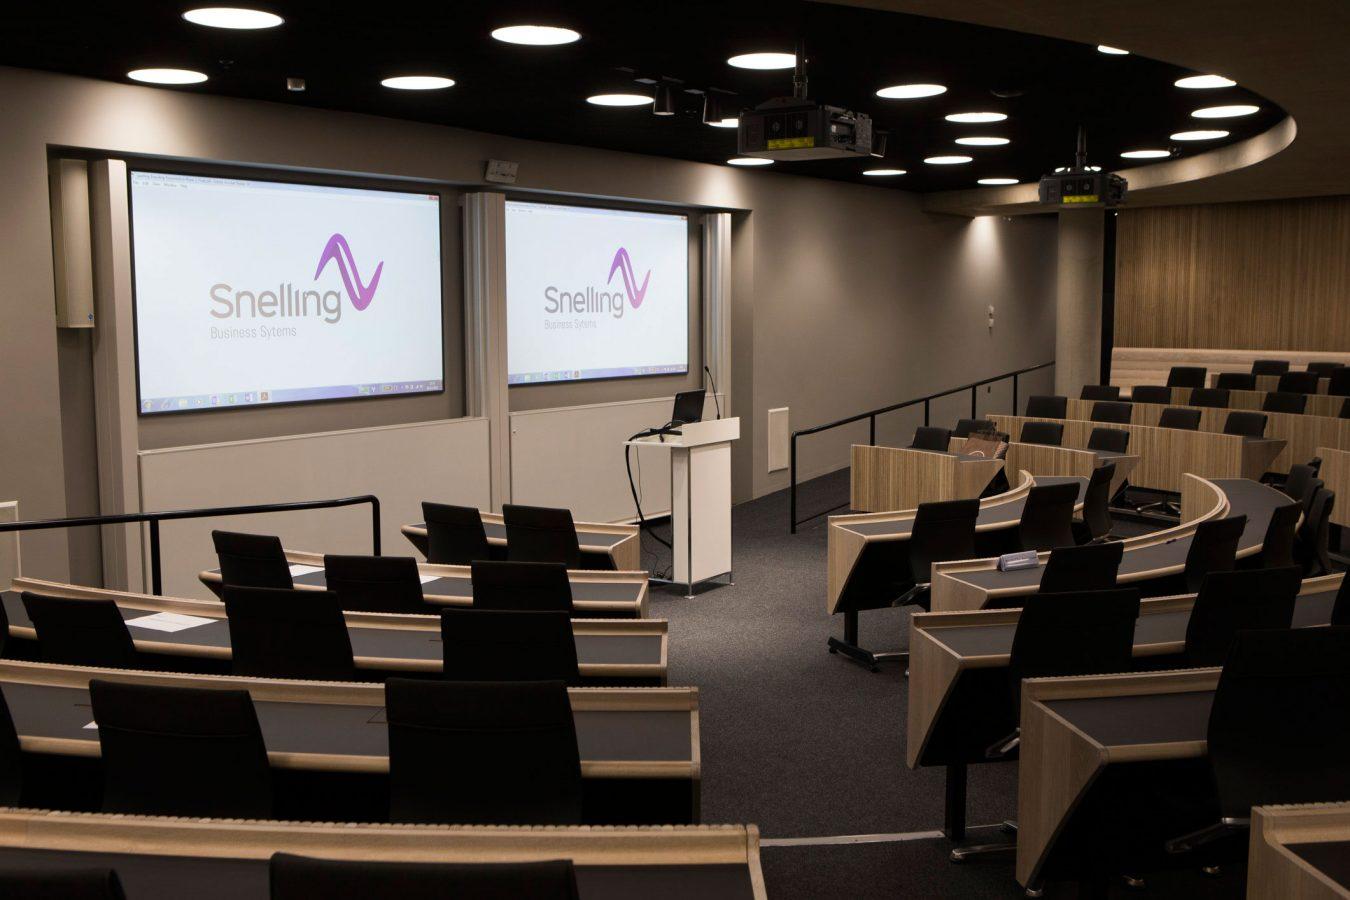 Blavatnik | Snelling Business Systems 17